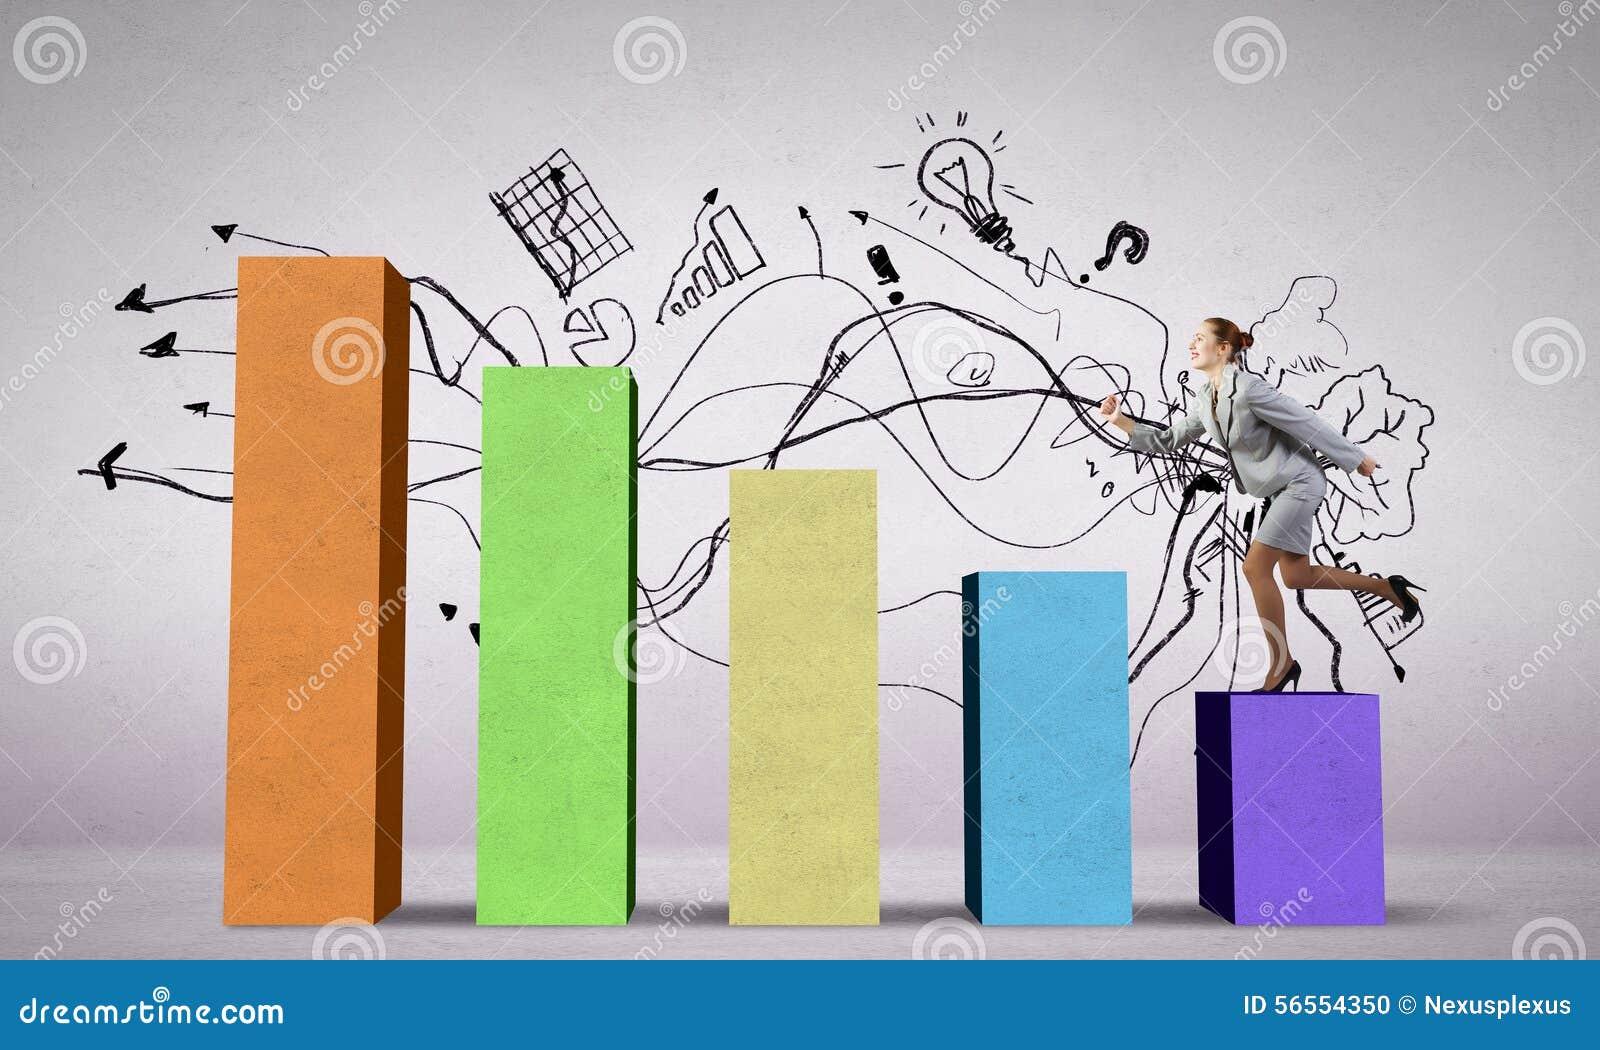 Download Στη σκάλα επιτυχίας στοκ εικόνες. εικόνα από graph, περπάτημα - 56554350